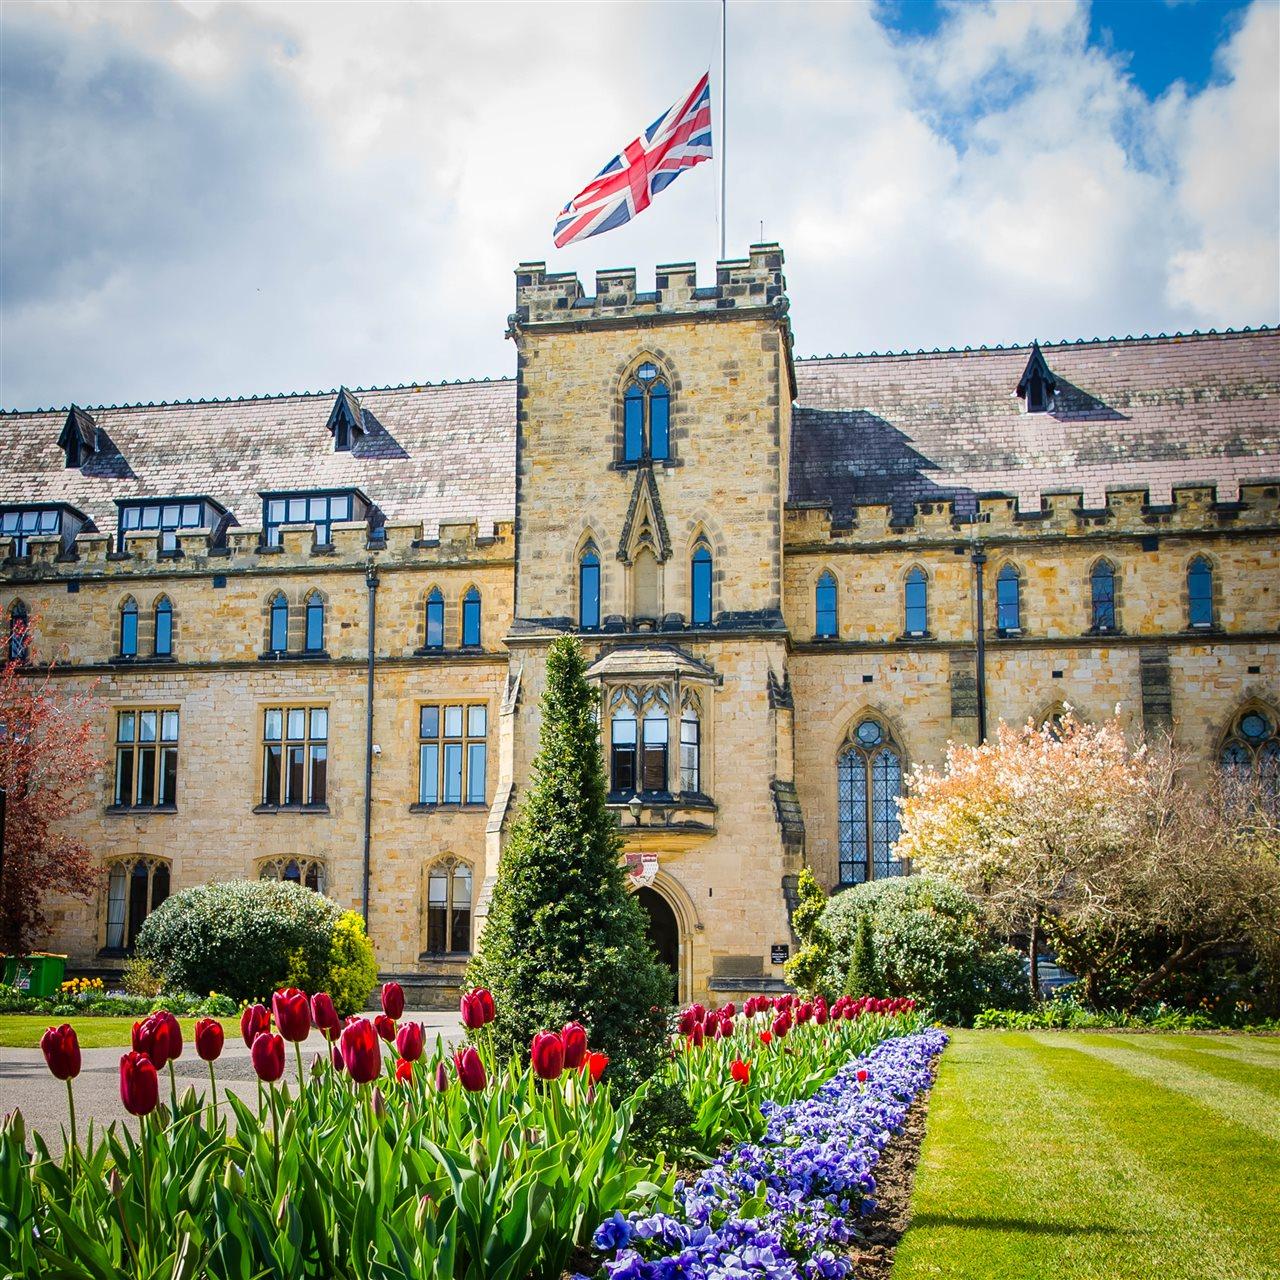 Tonbridge School Tower flying flag in gardens